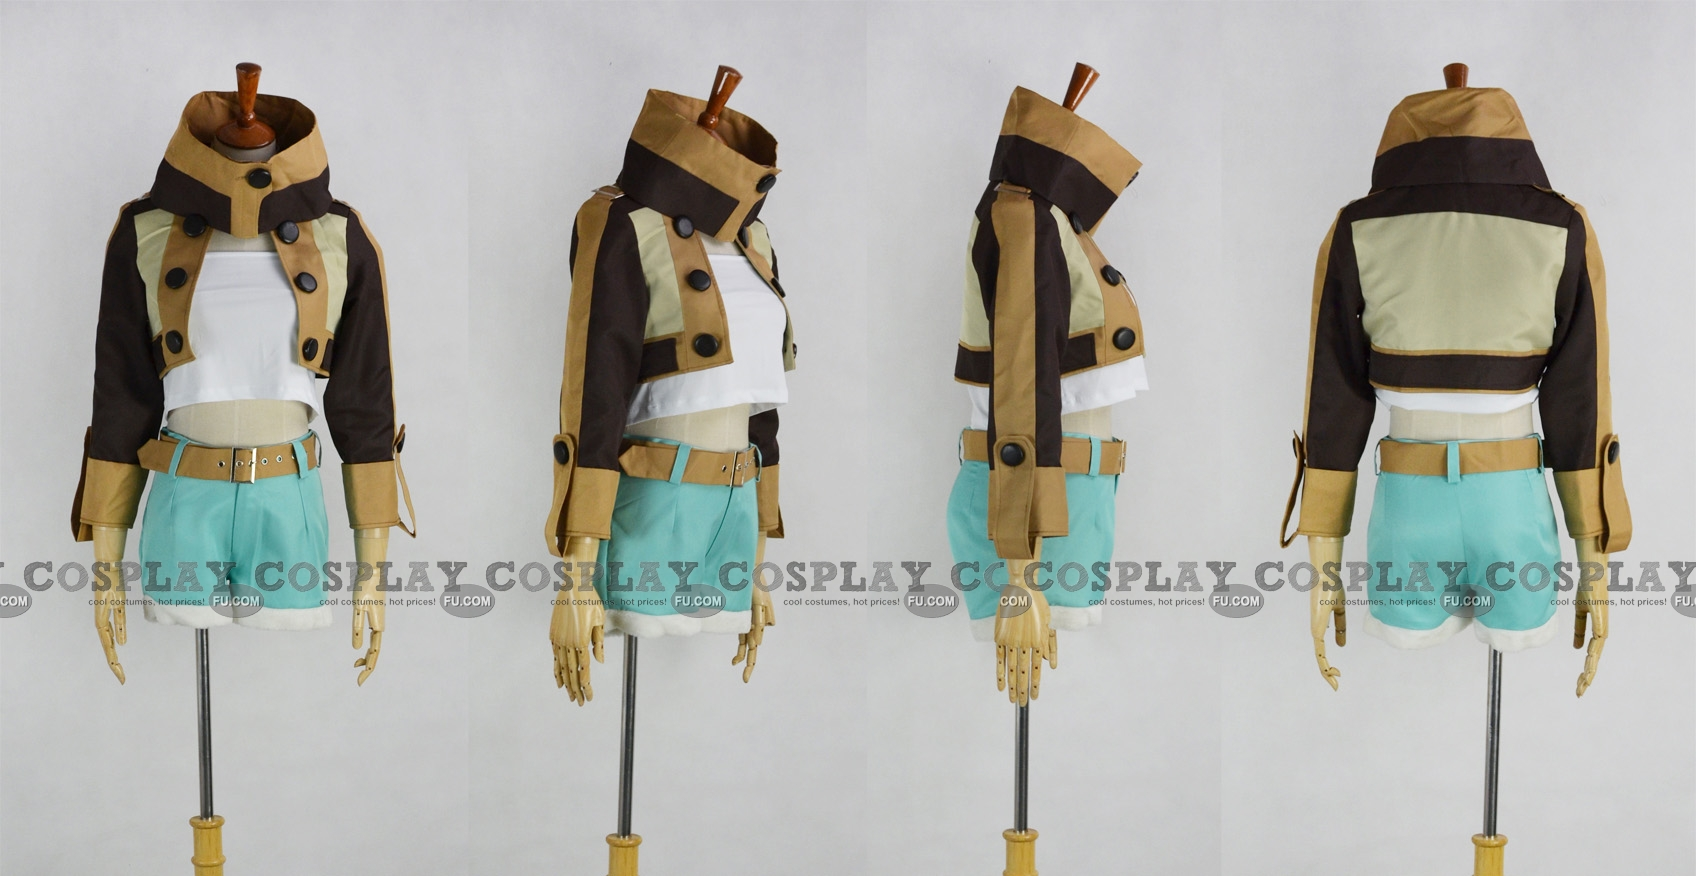 Haruka Seragaki Cosplay Costume from DRAMAtical Murder